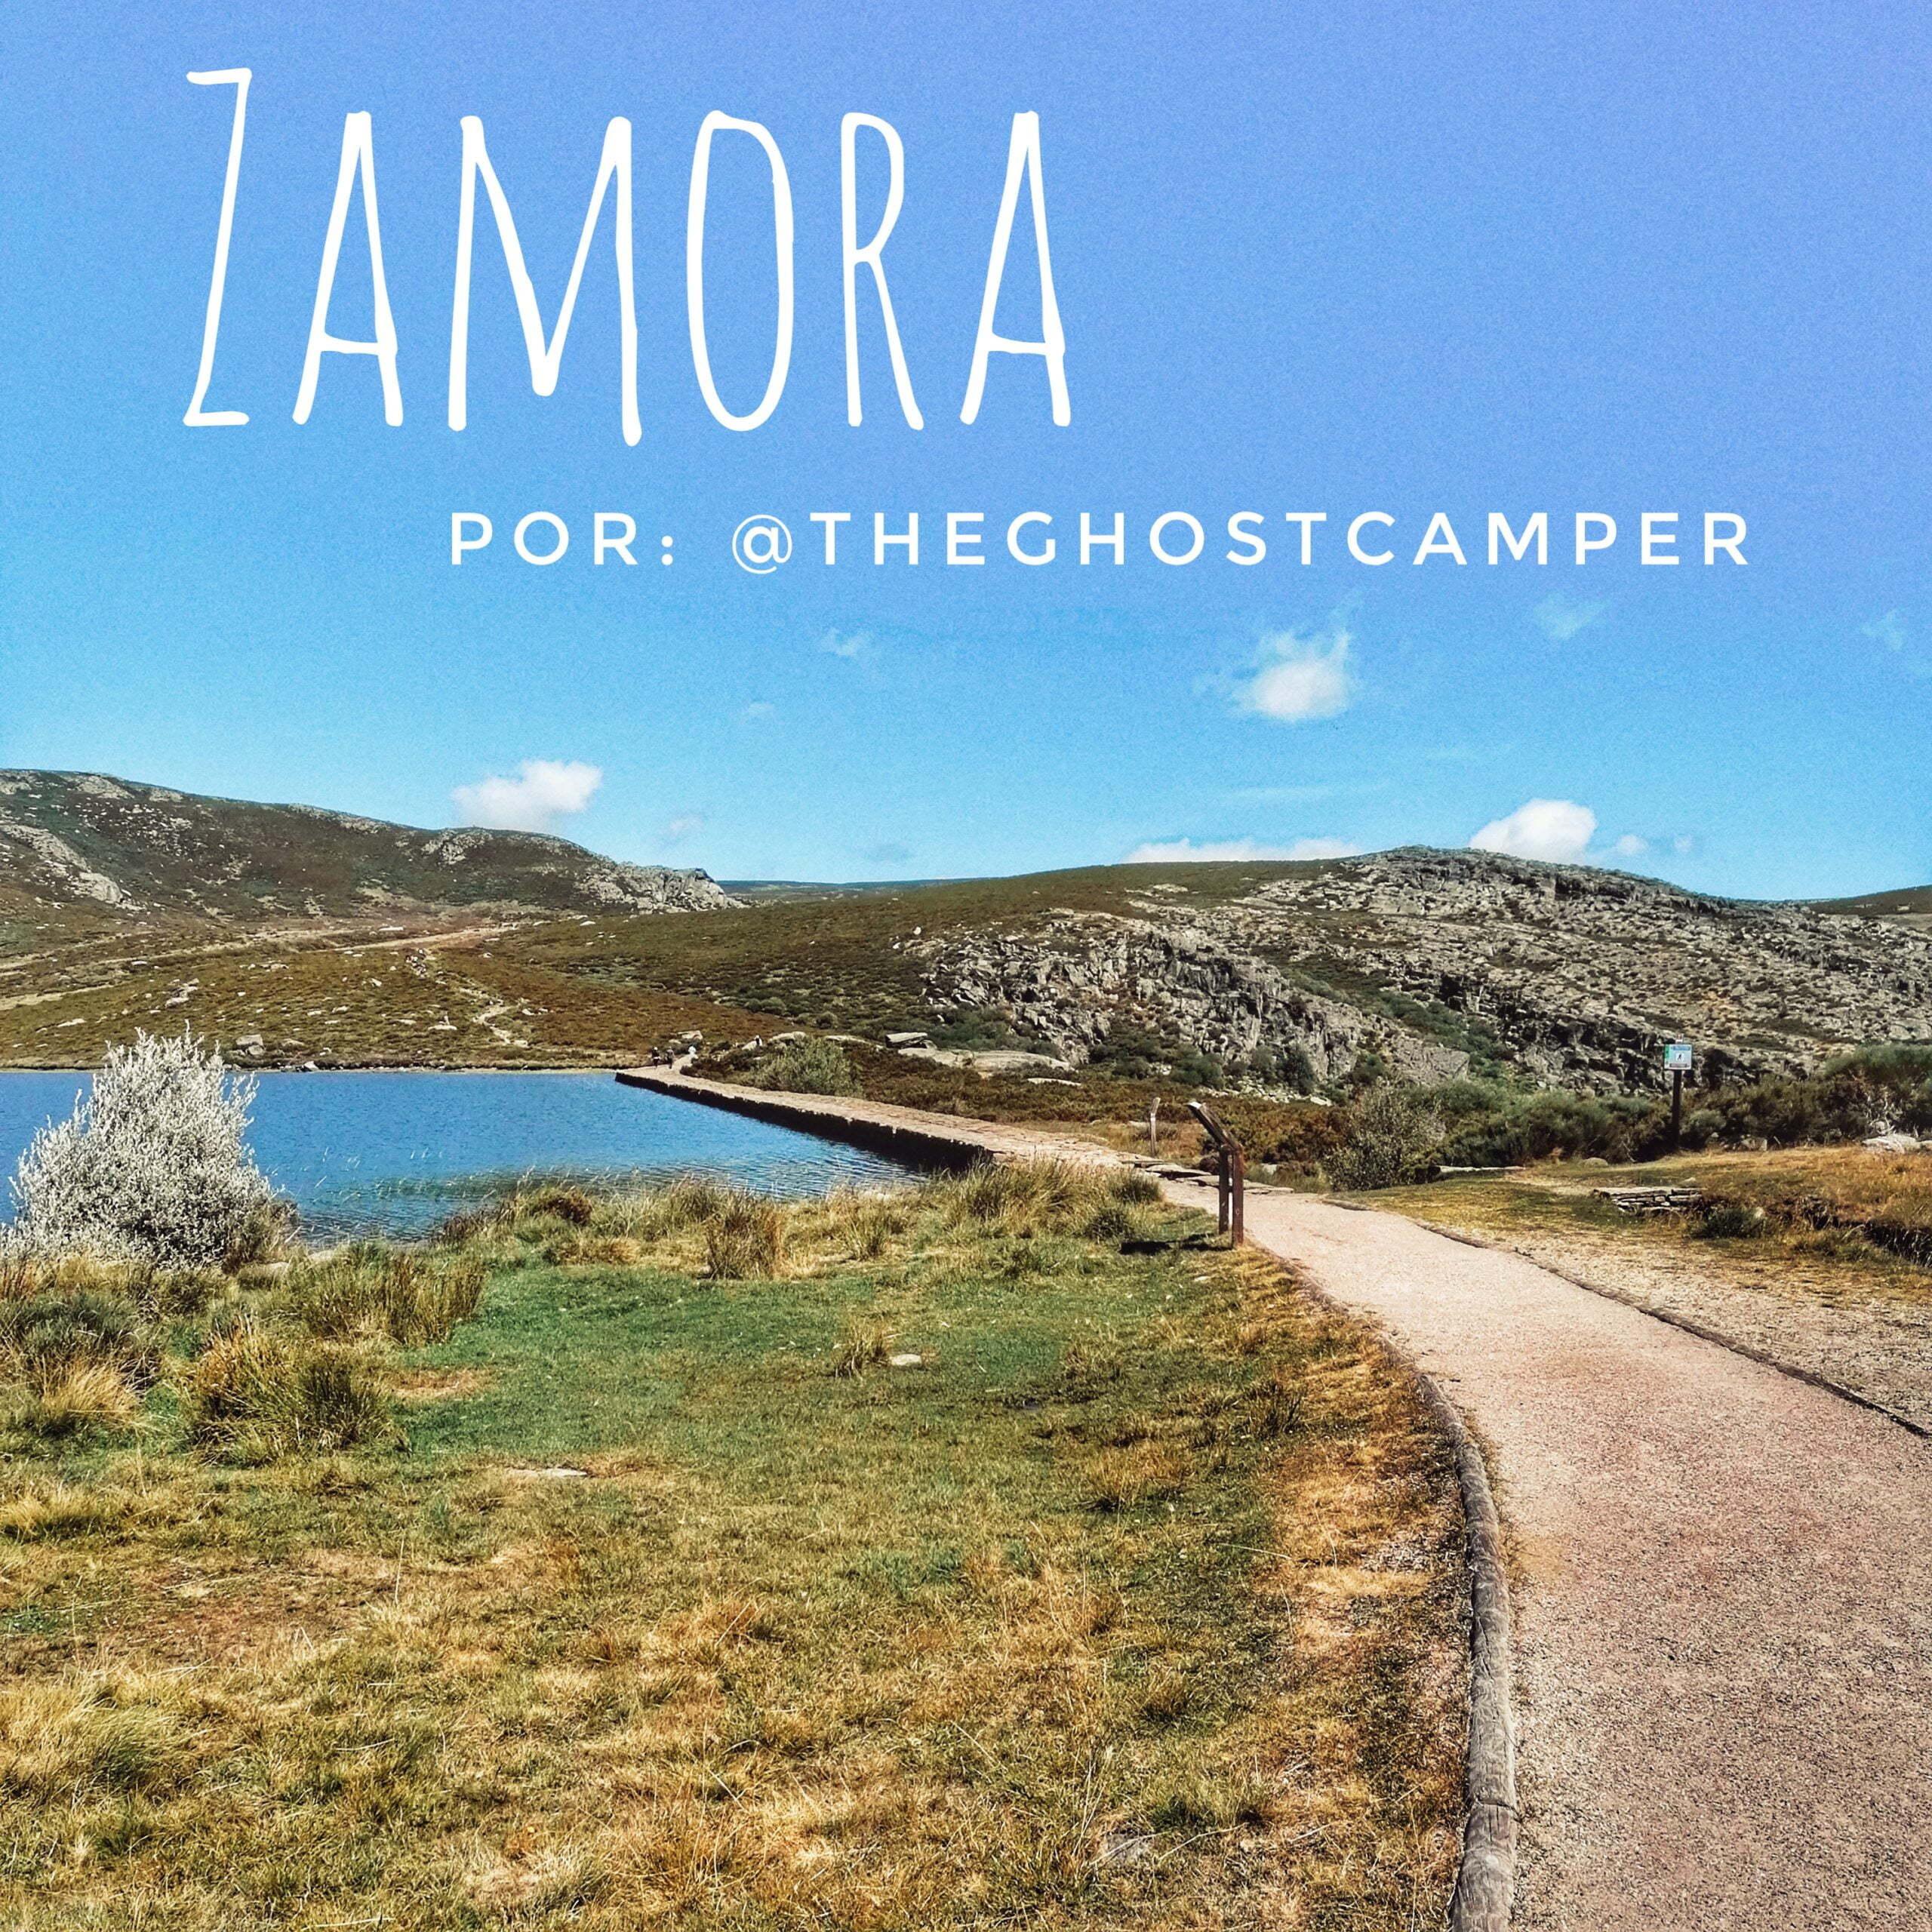 Traversez Zamora, un joyau à découvrir par @theghostcamper